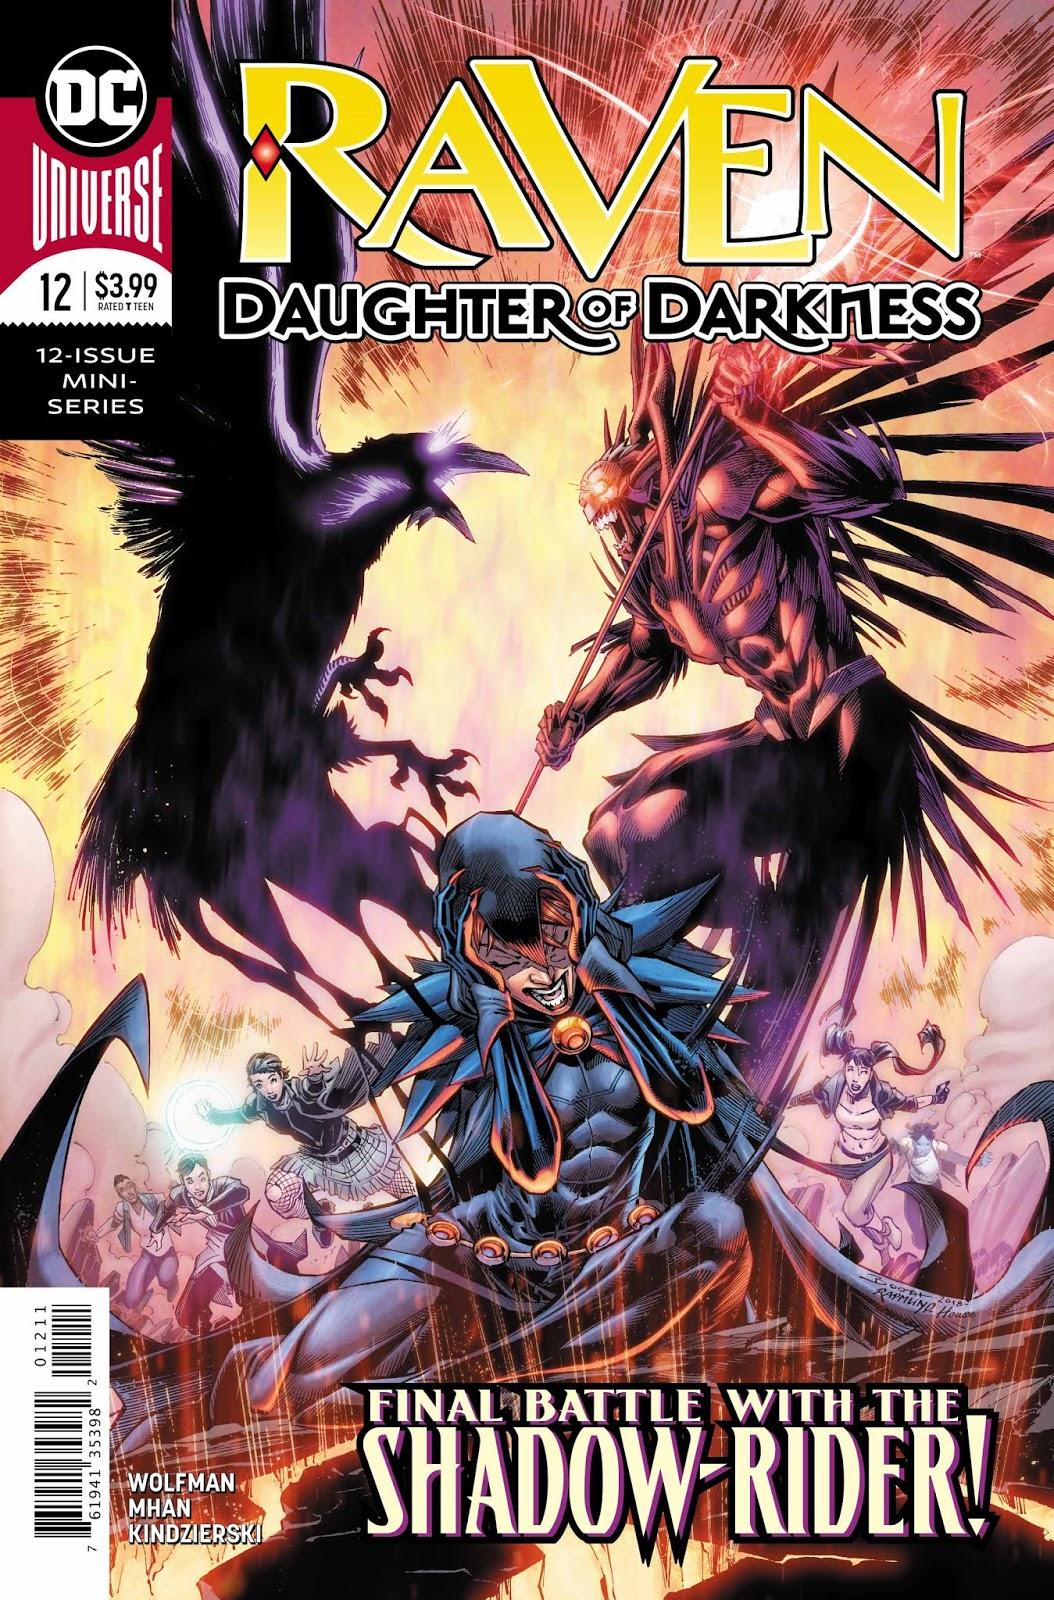 Weird Science DC Comics: Raven: Daughter of Darkness #12